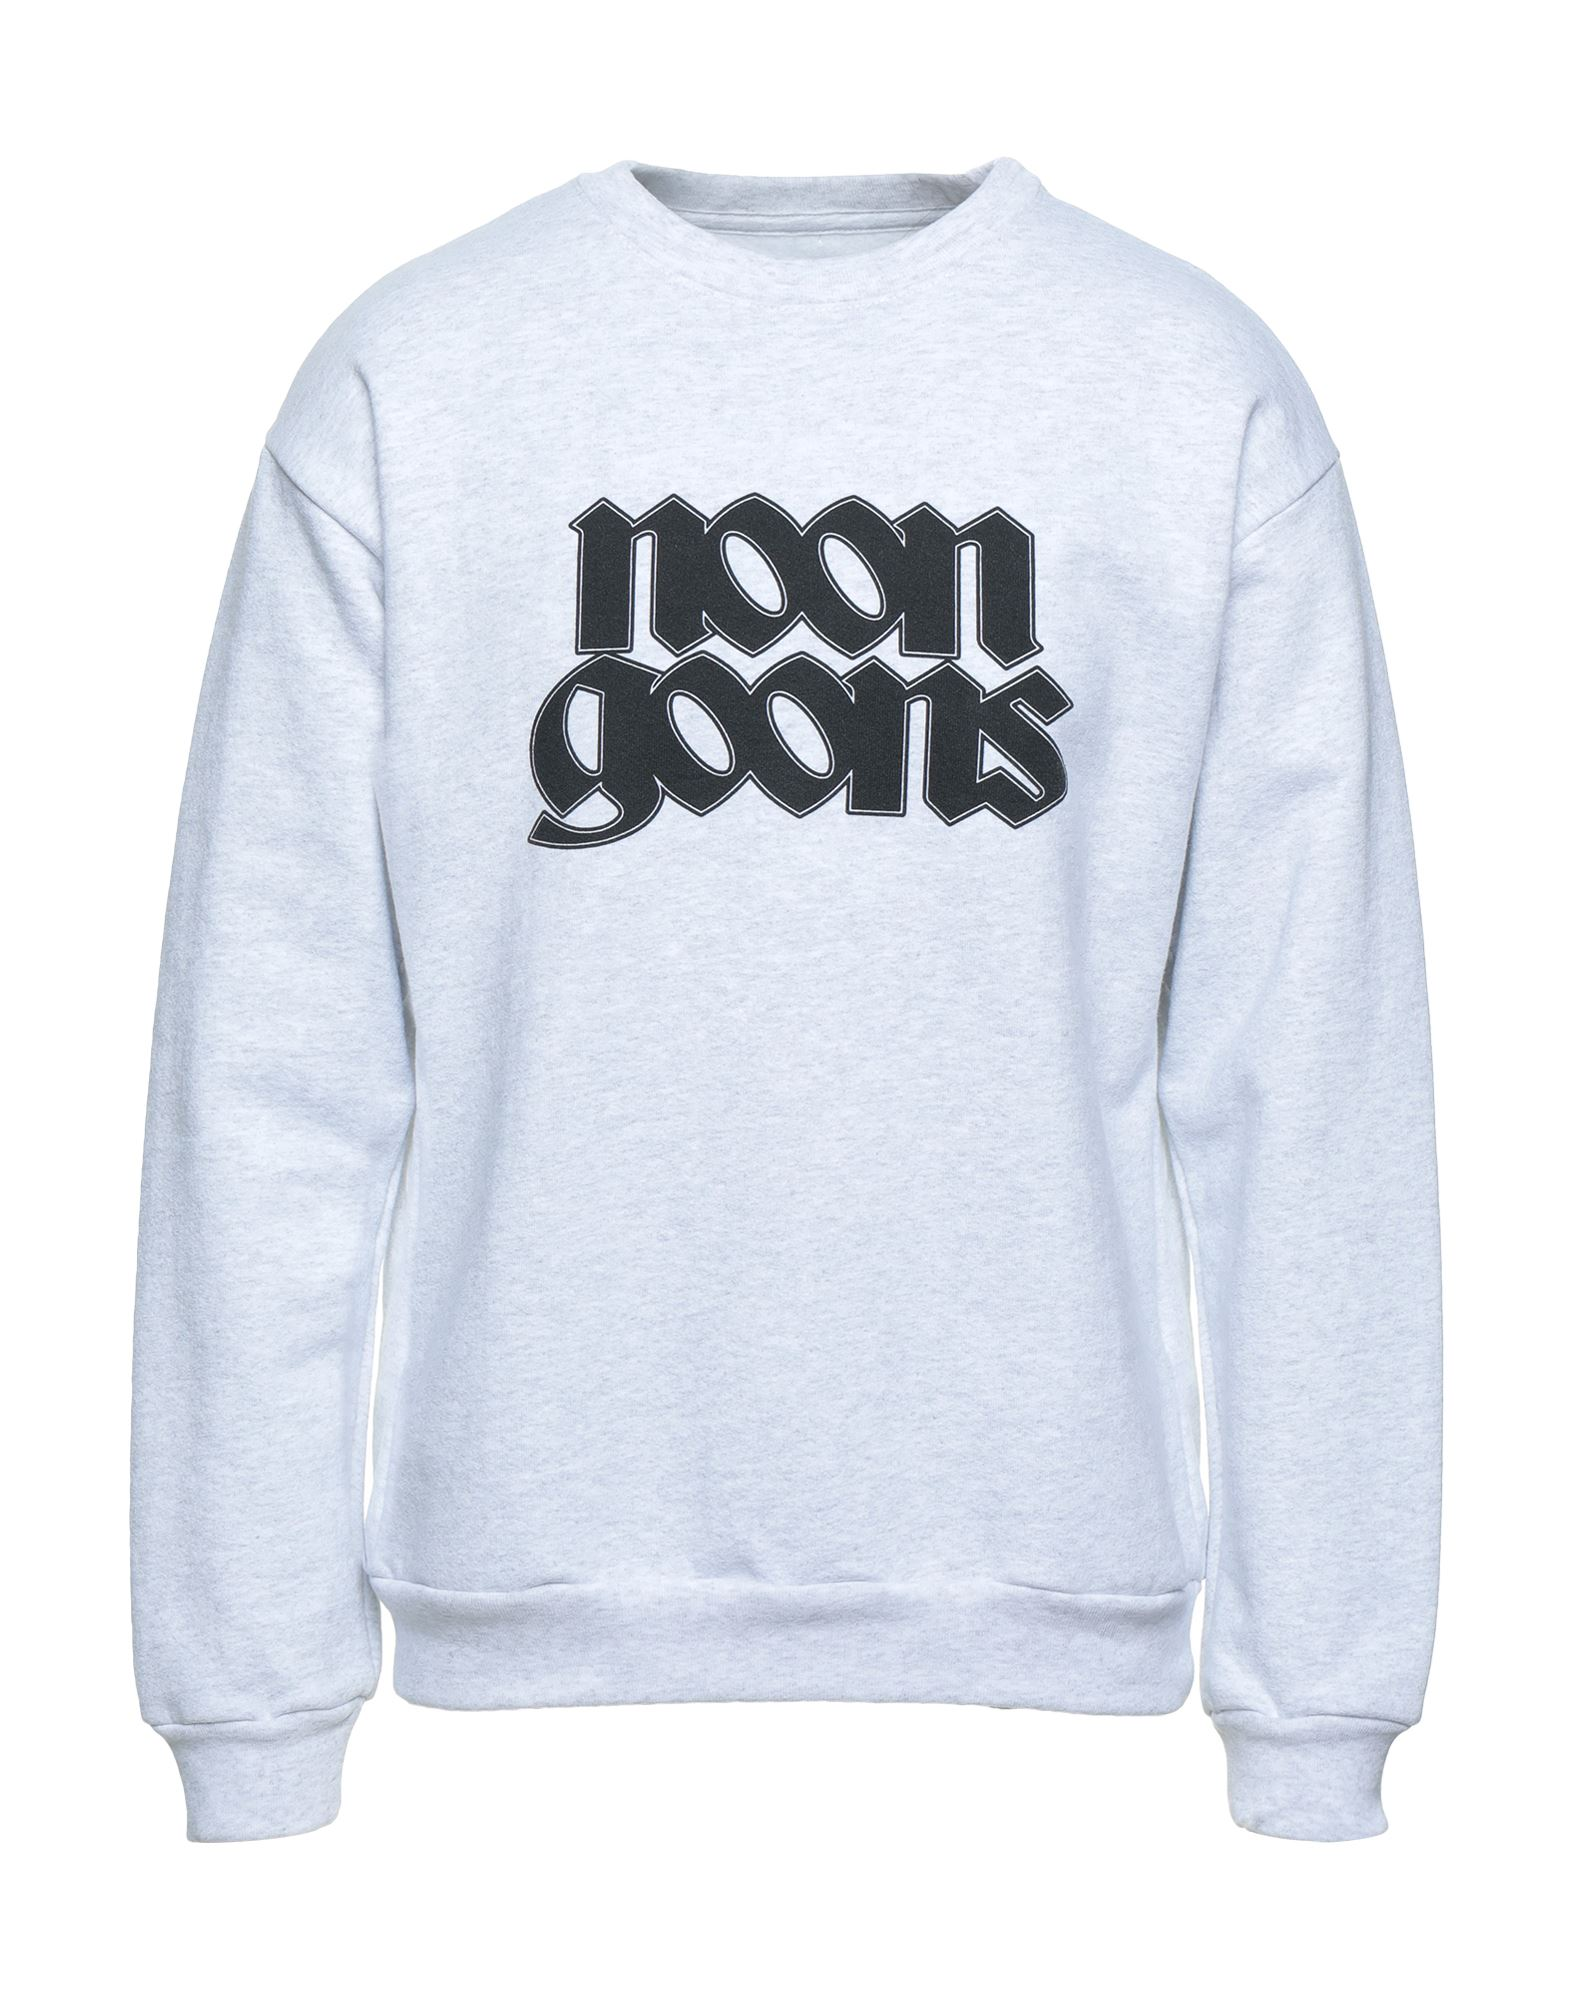 the goons the goons the best of the goons 2 cd NOON GOONS Толстовка